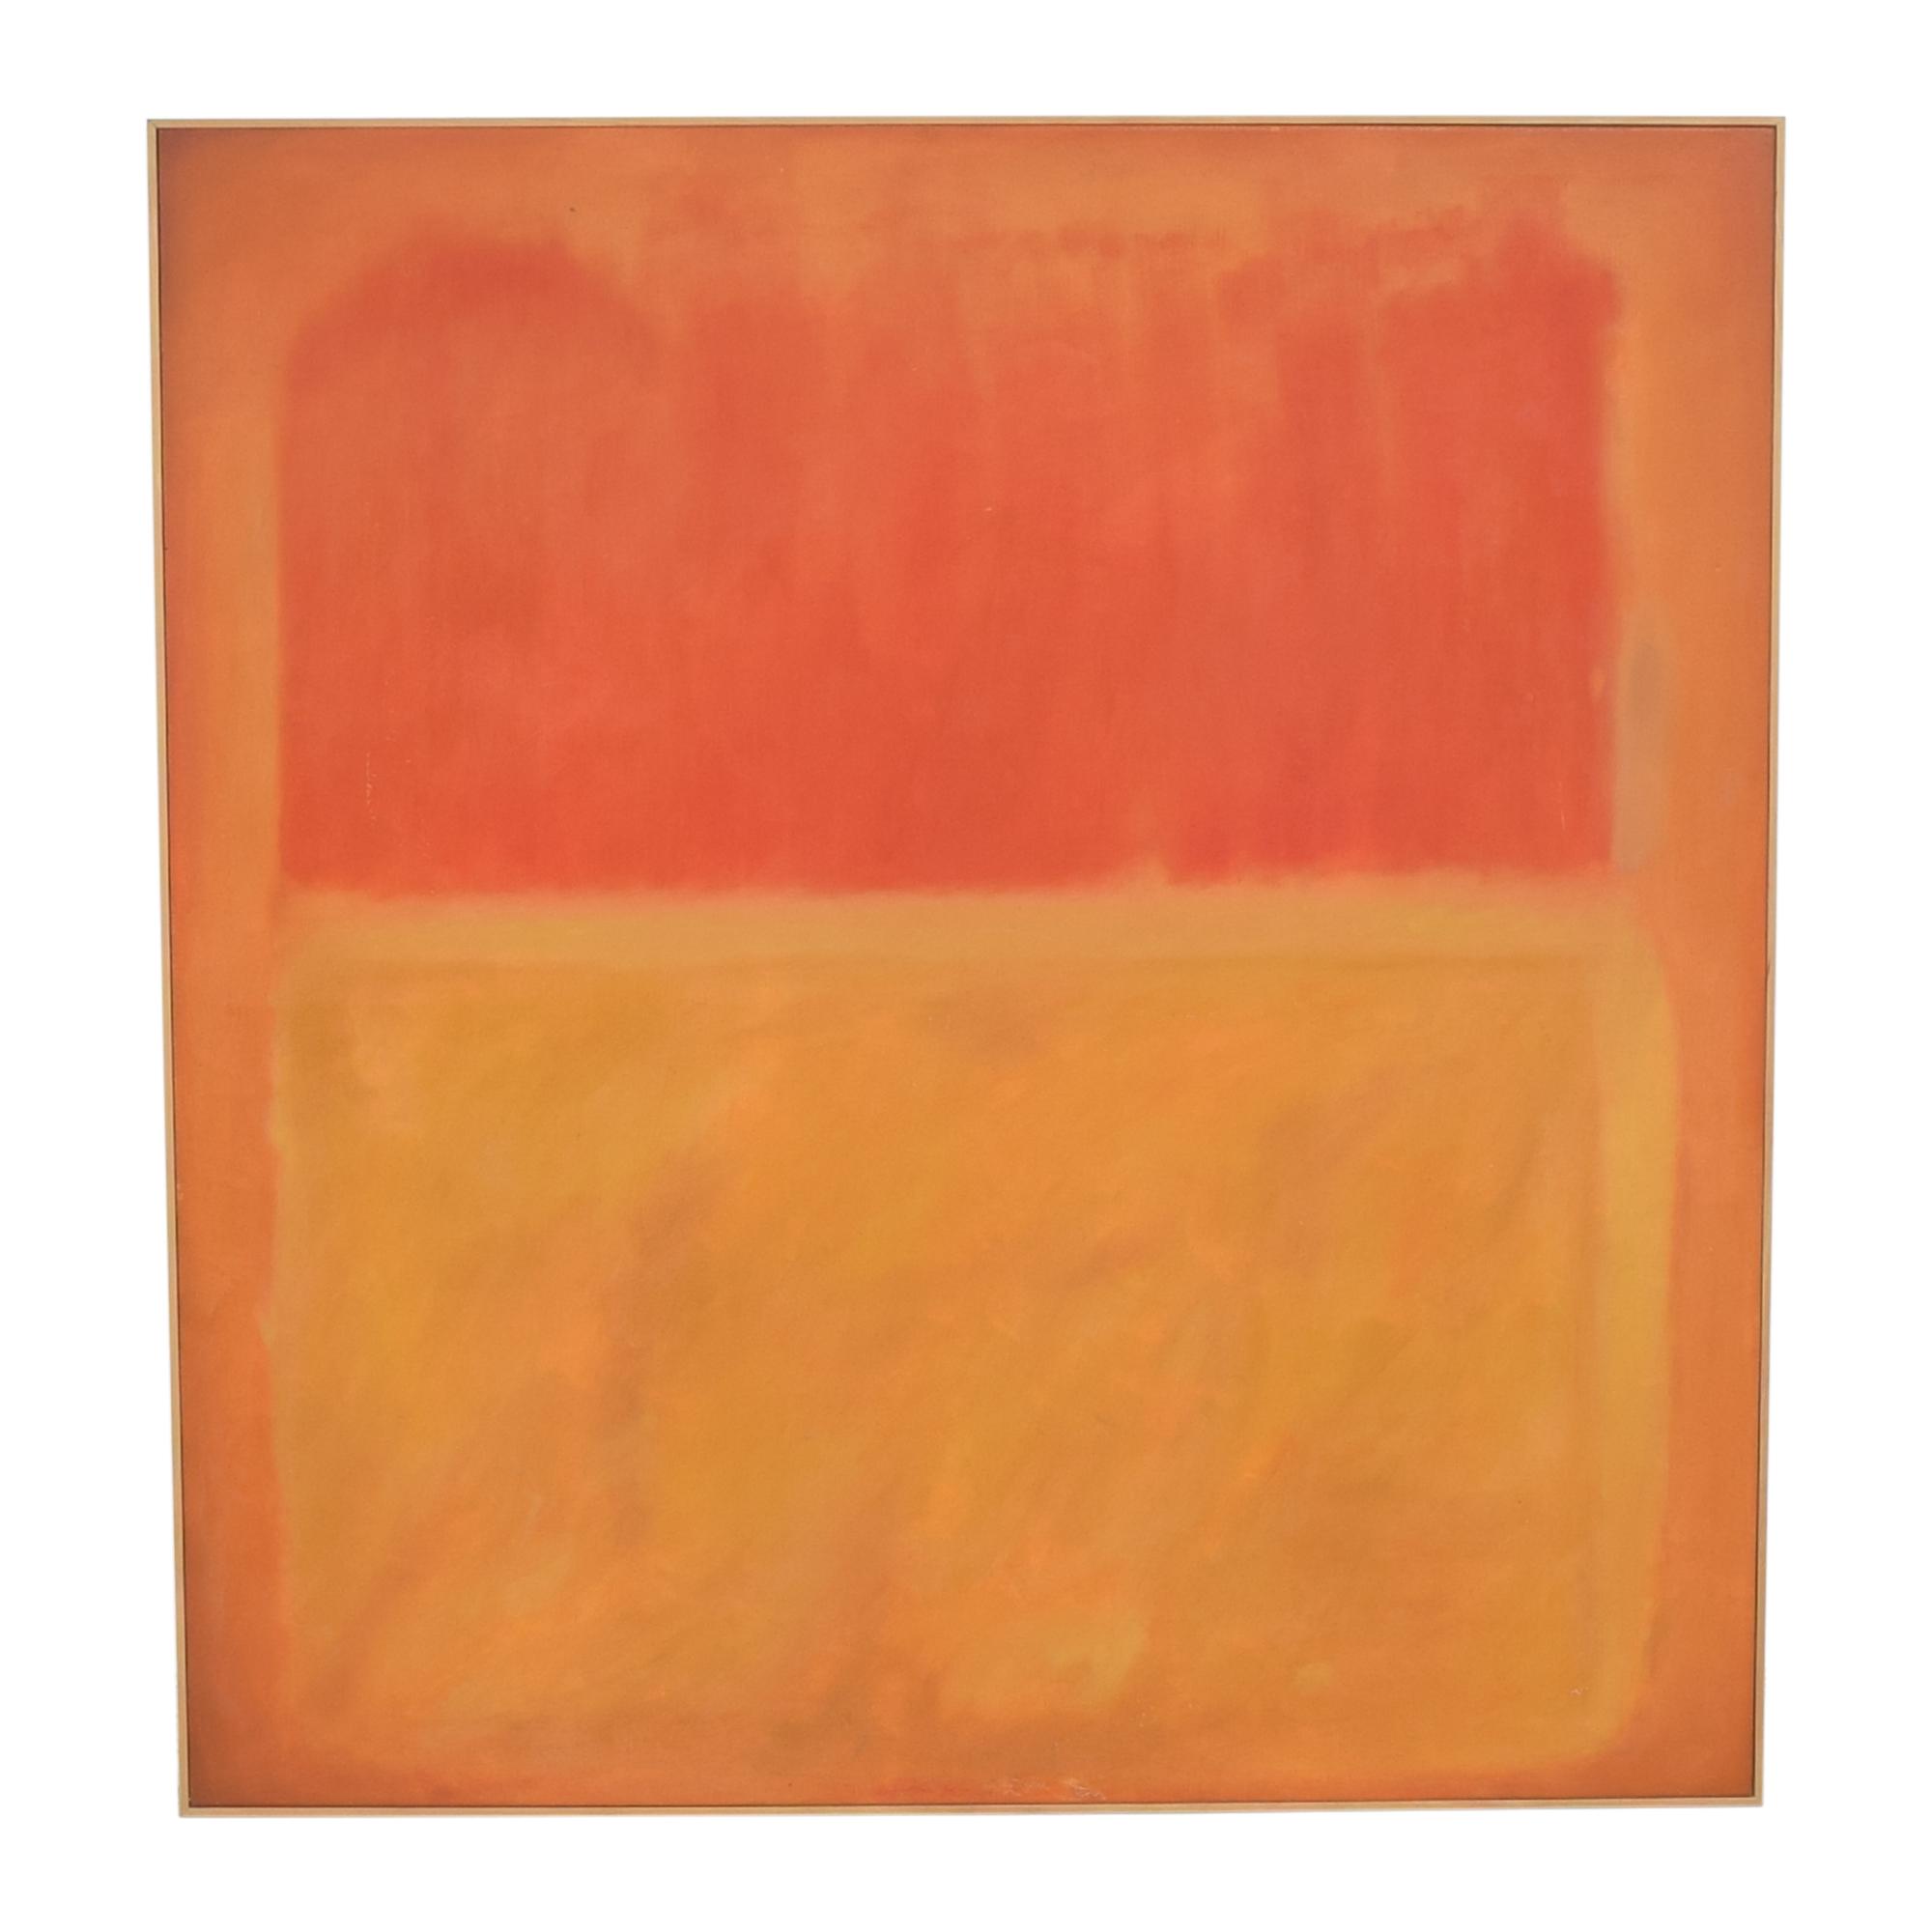 Rothko-Style Wall Art dimensions